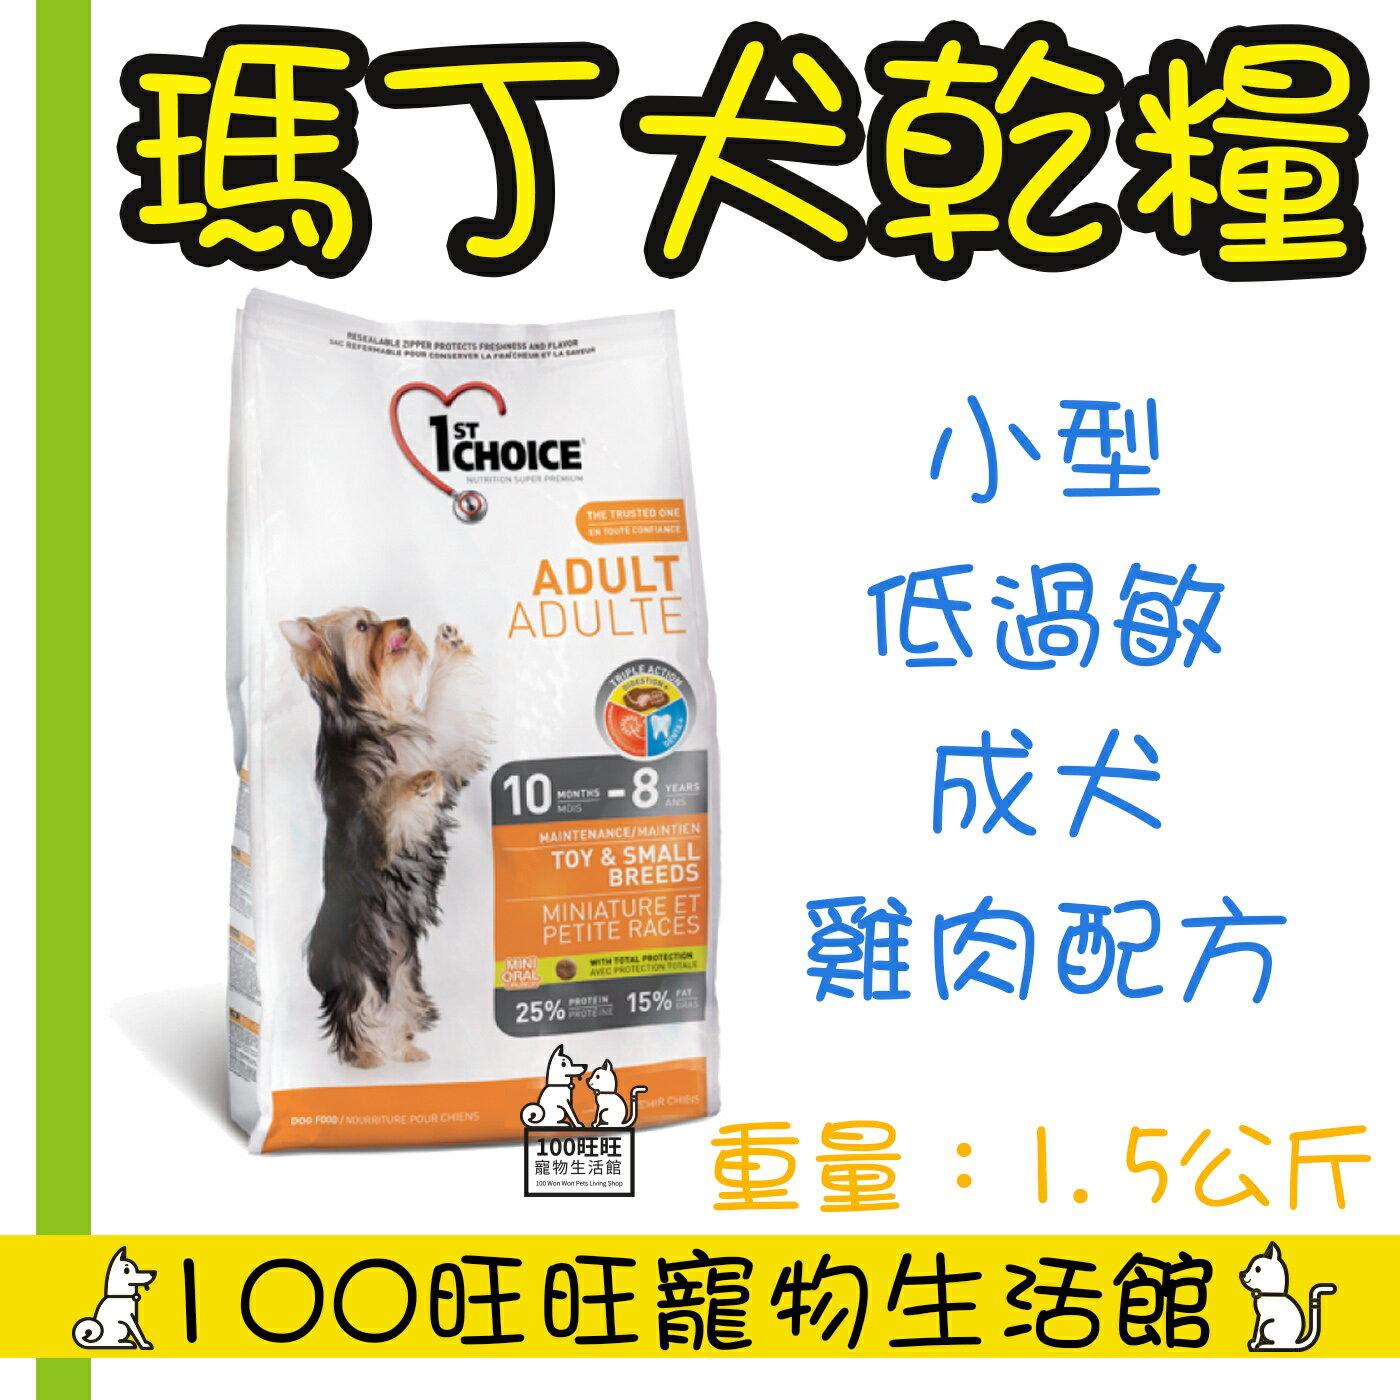 1stCHOICE 瑪丁 小型成犬配方 雞肉 1.5kg